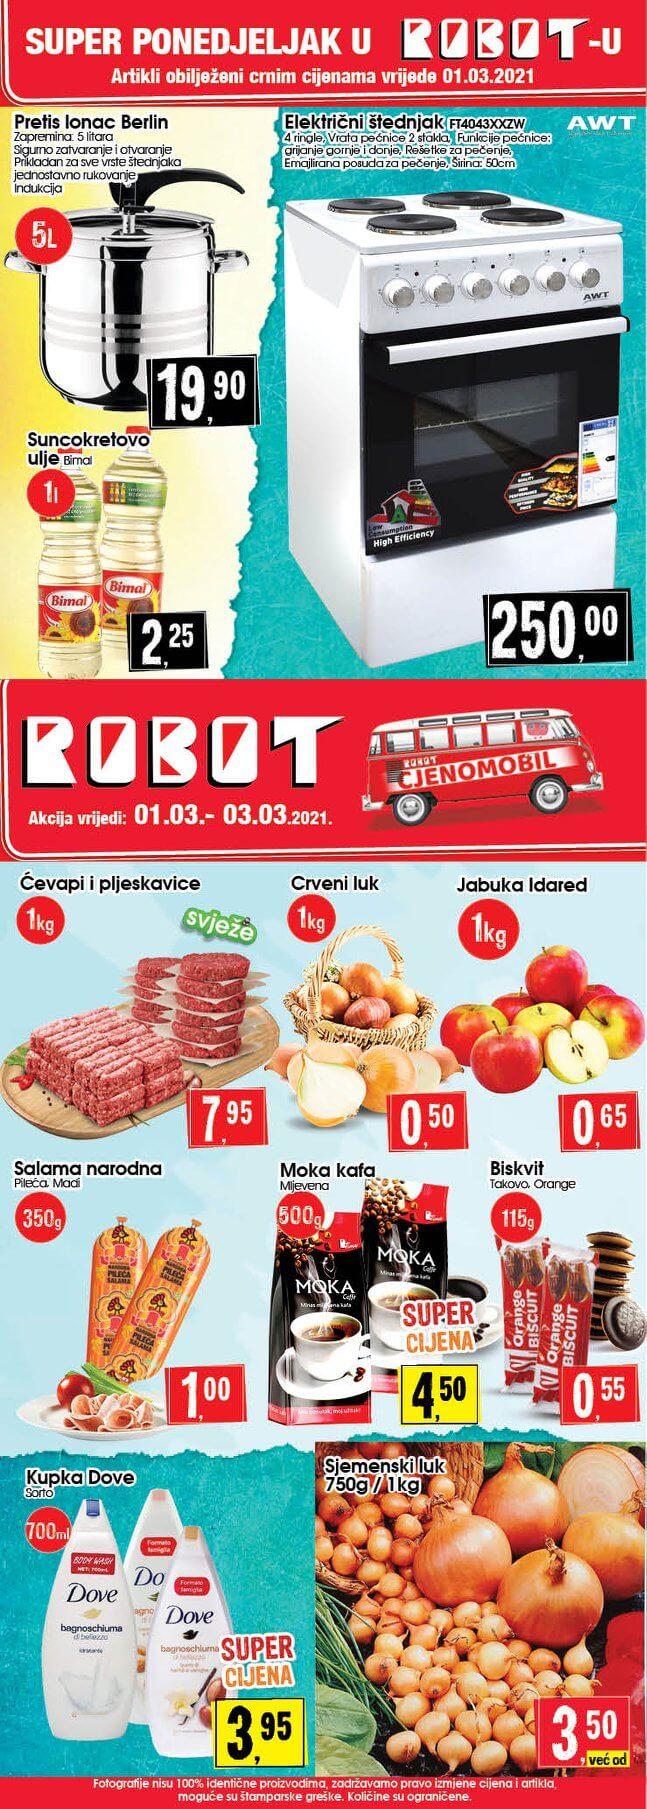 ROBOT Katalog Super akcija MART 2021 01.03.2021. 03.03.2021.